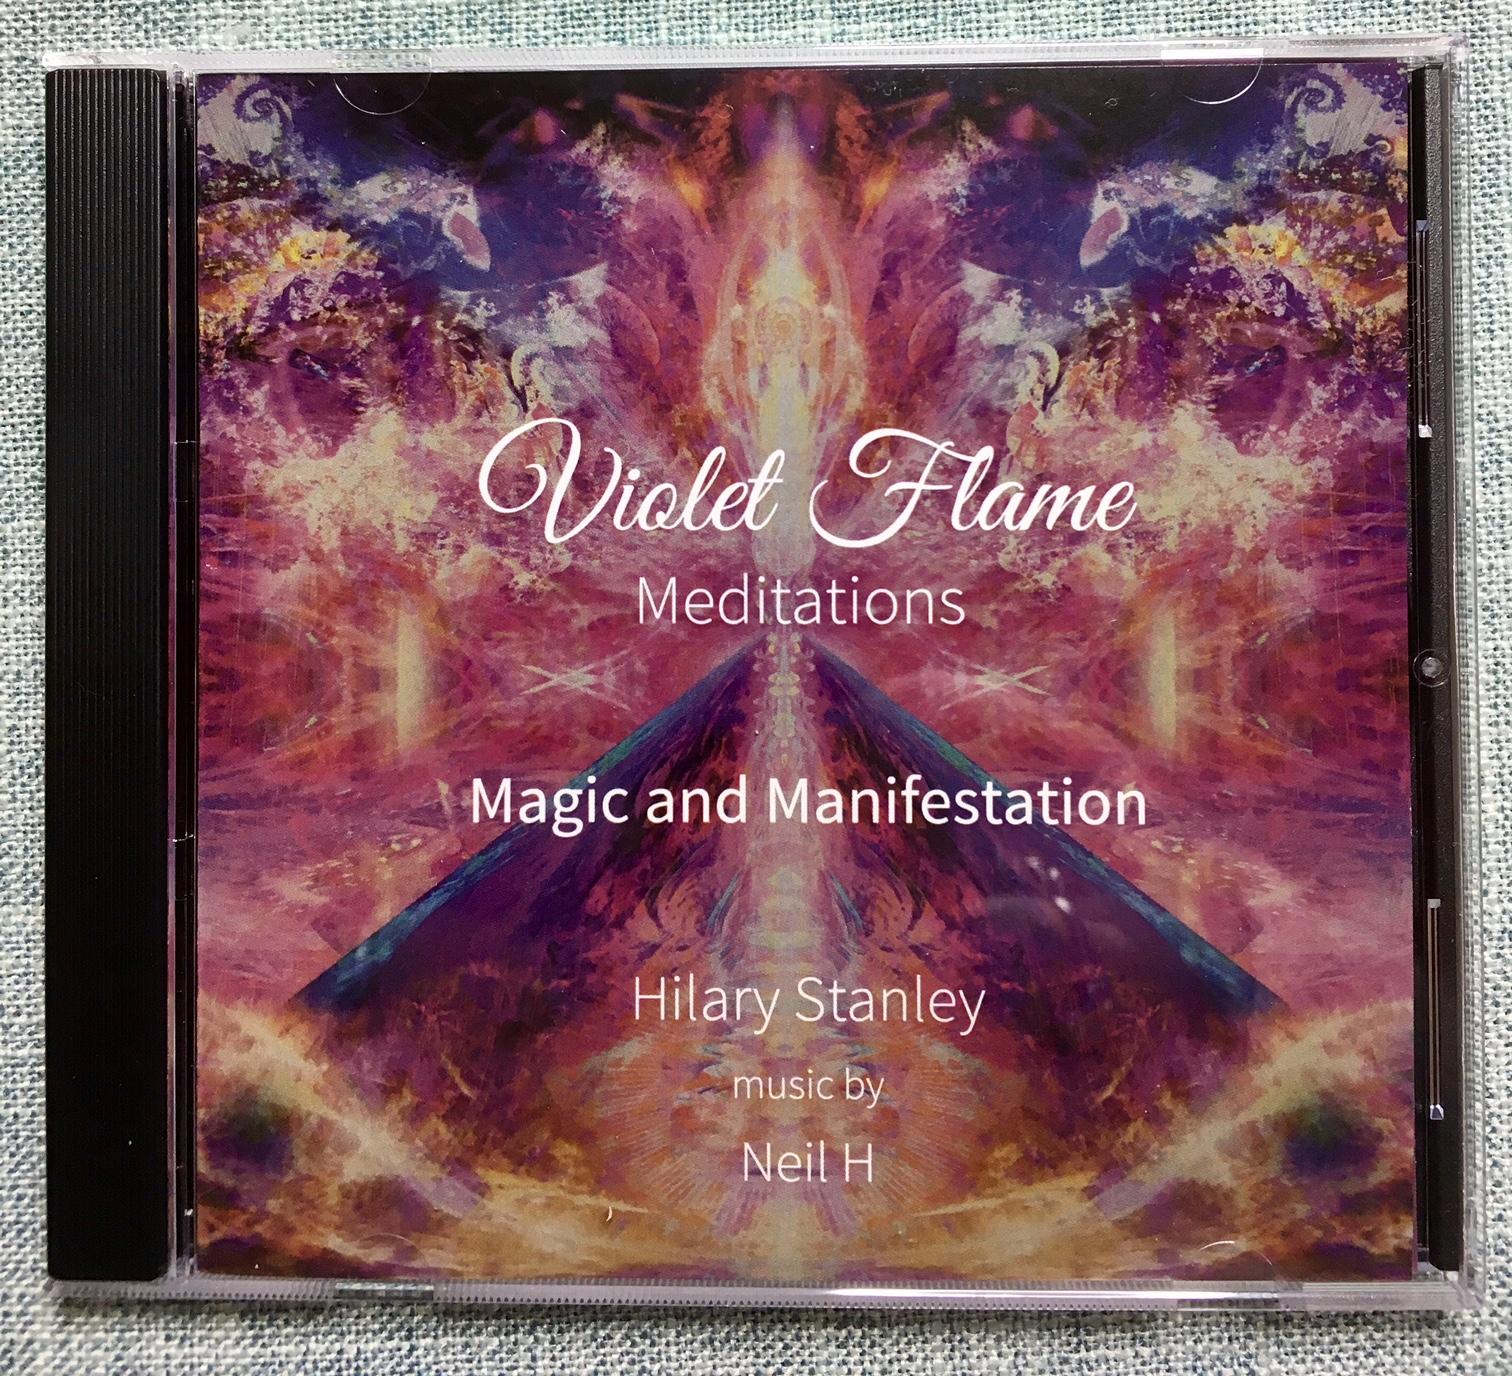 Magic and Manifestation Meditation CD